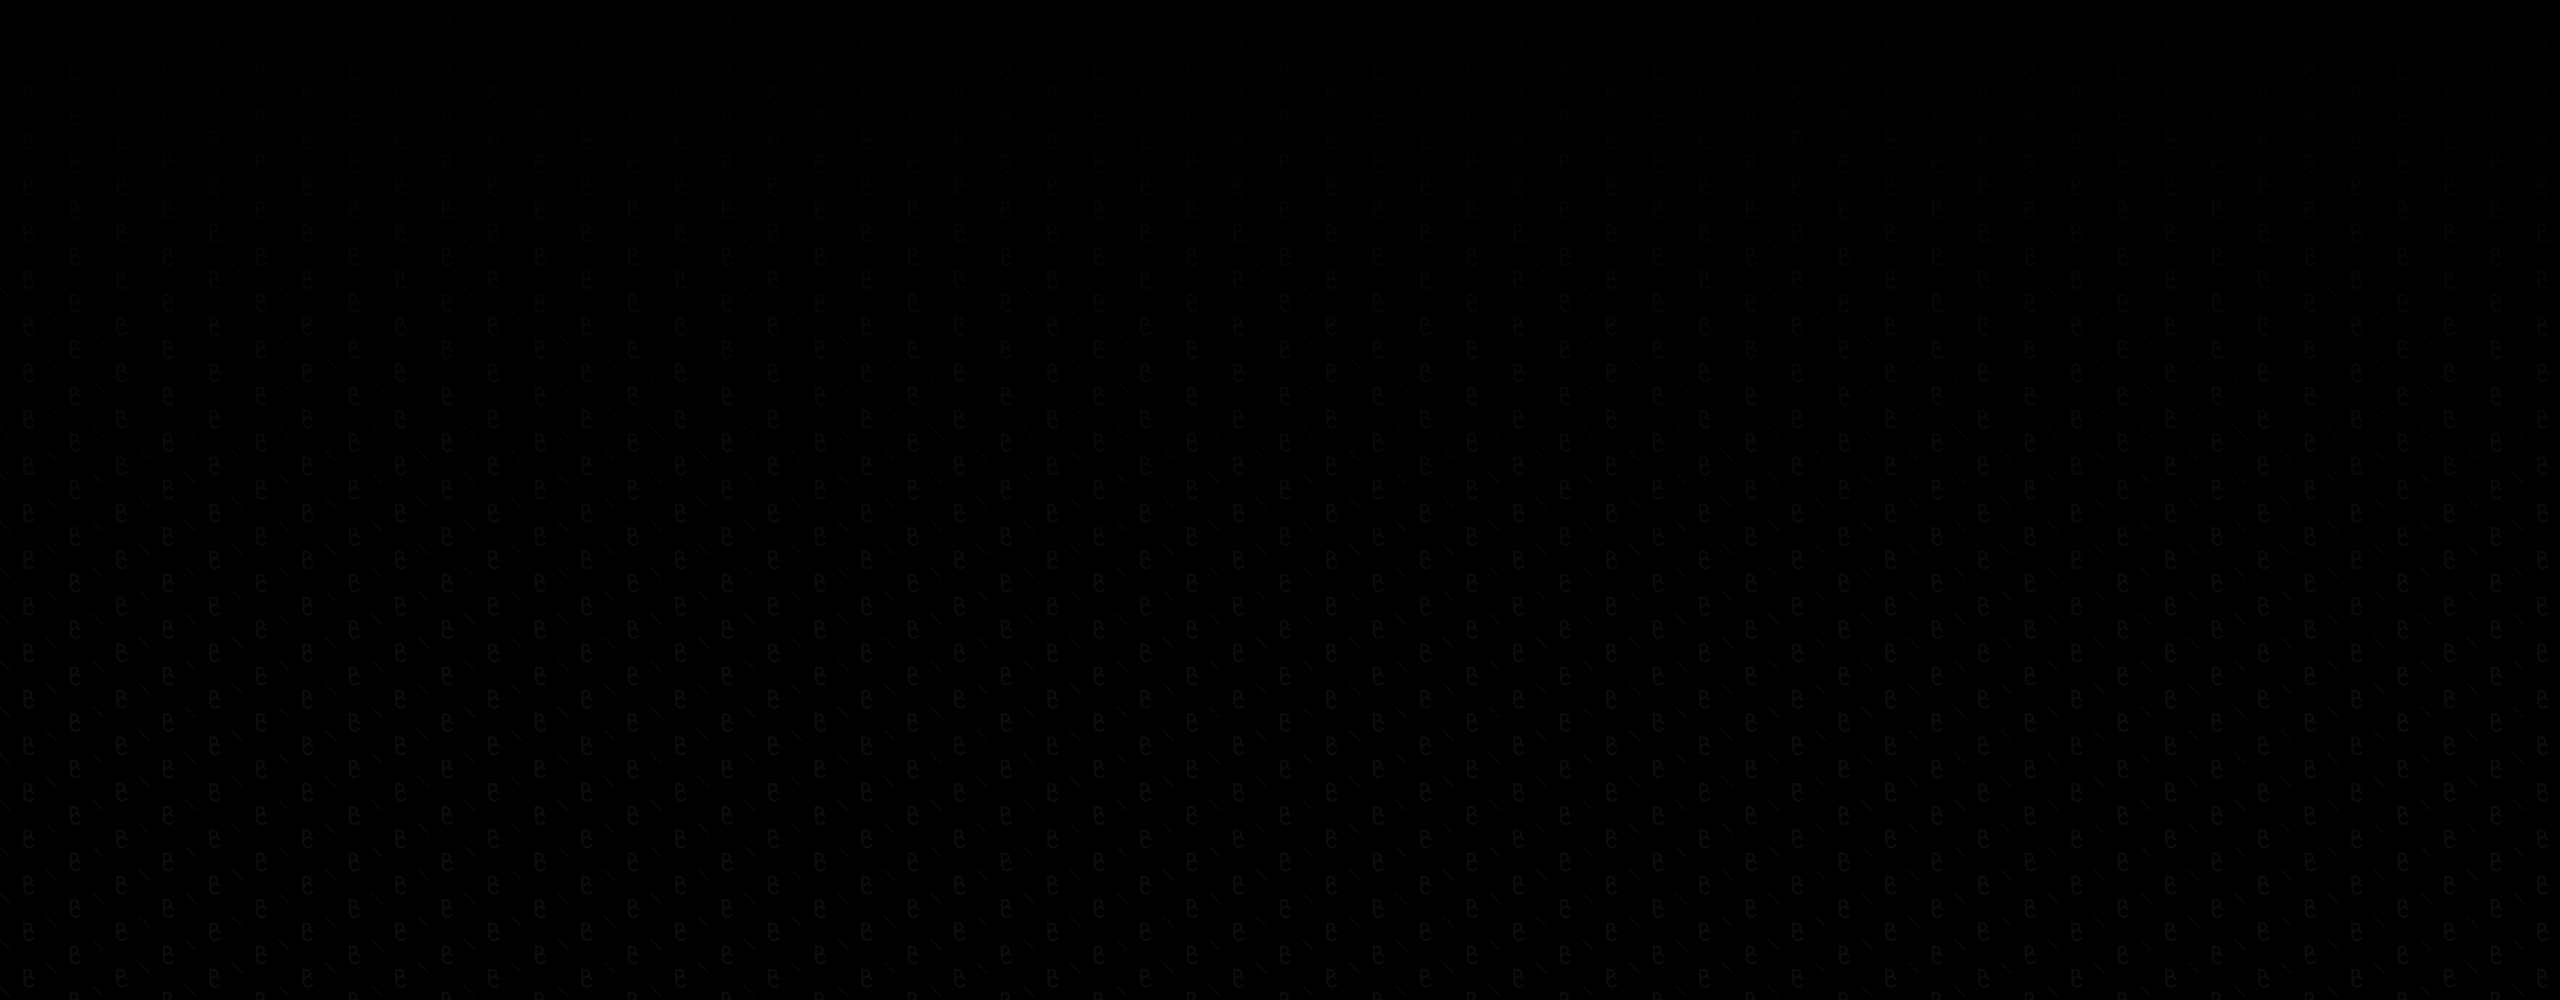 Логотип «Блэк Черри»